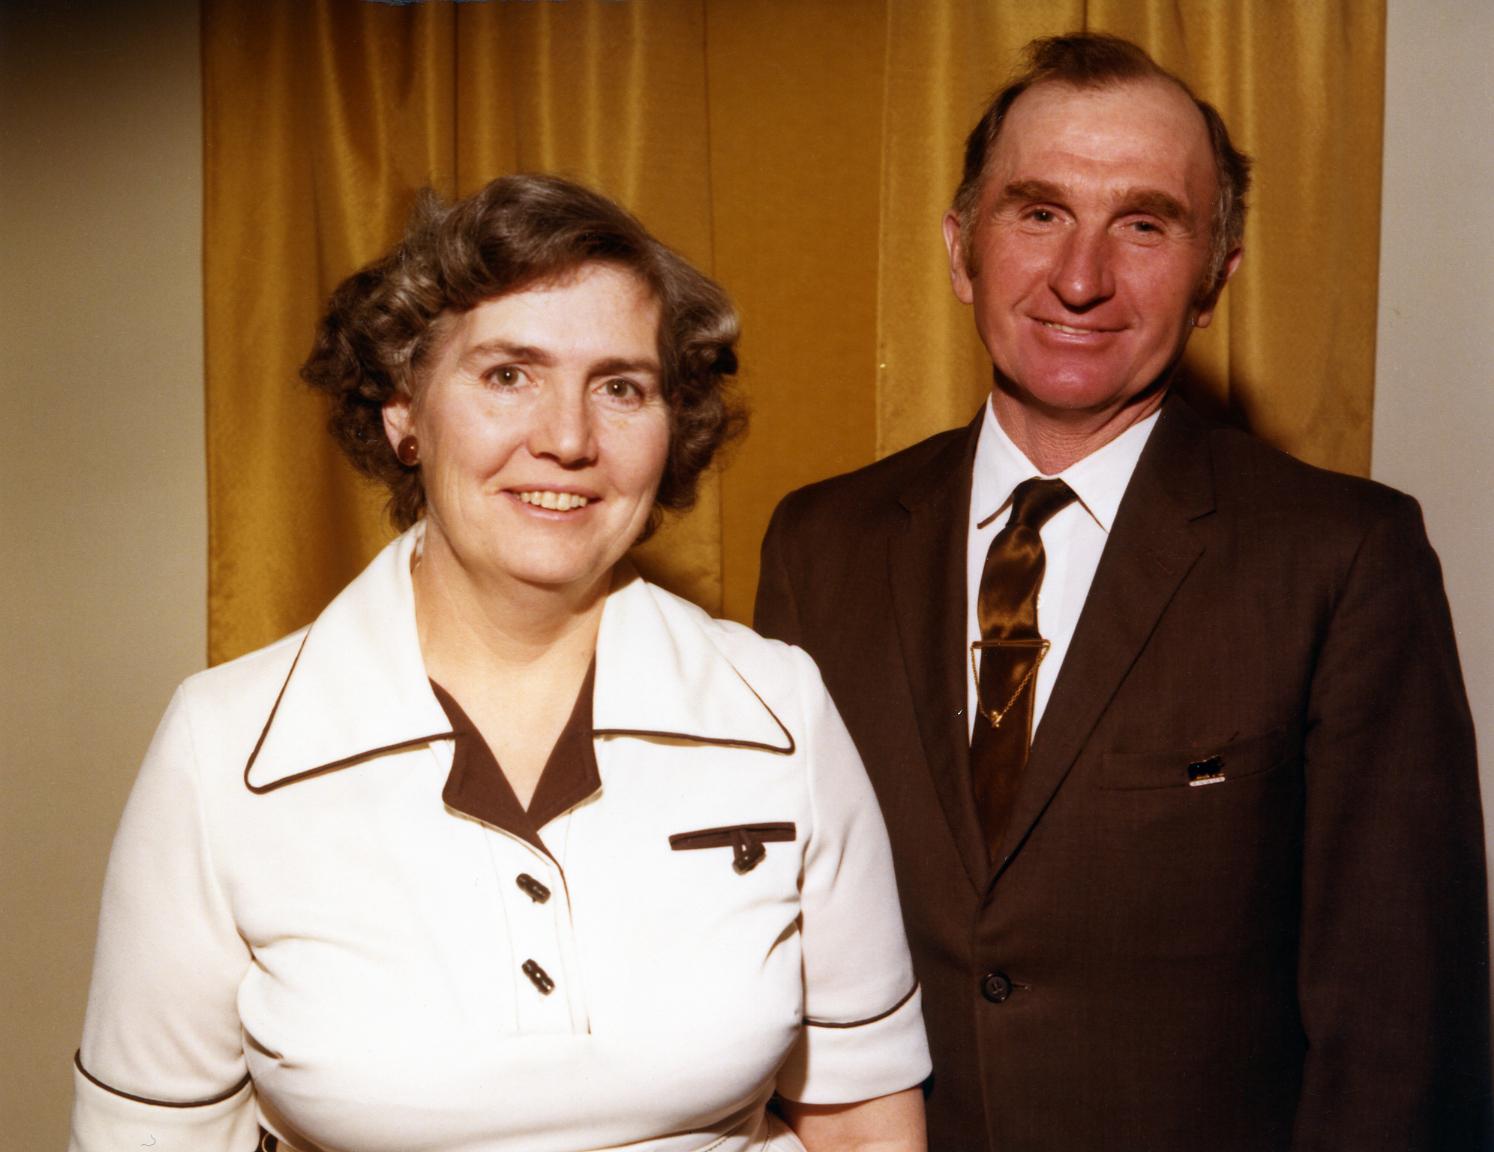 J. Russel & Ruth Simpson